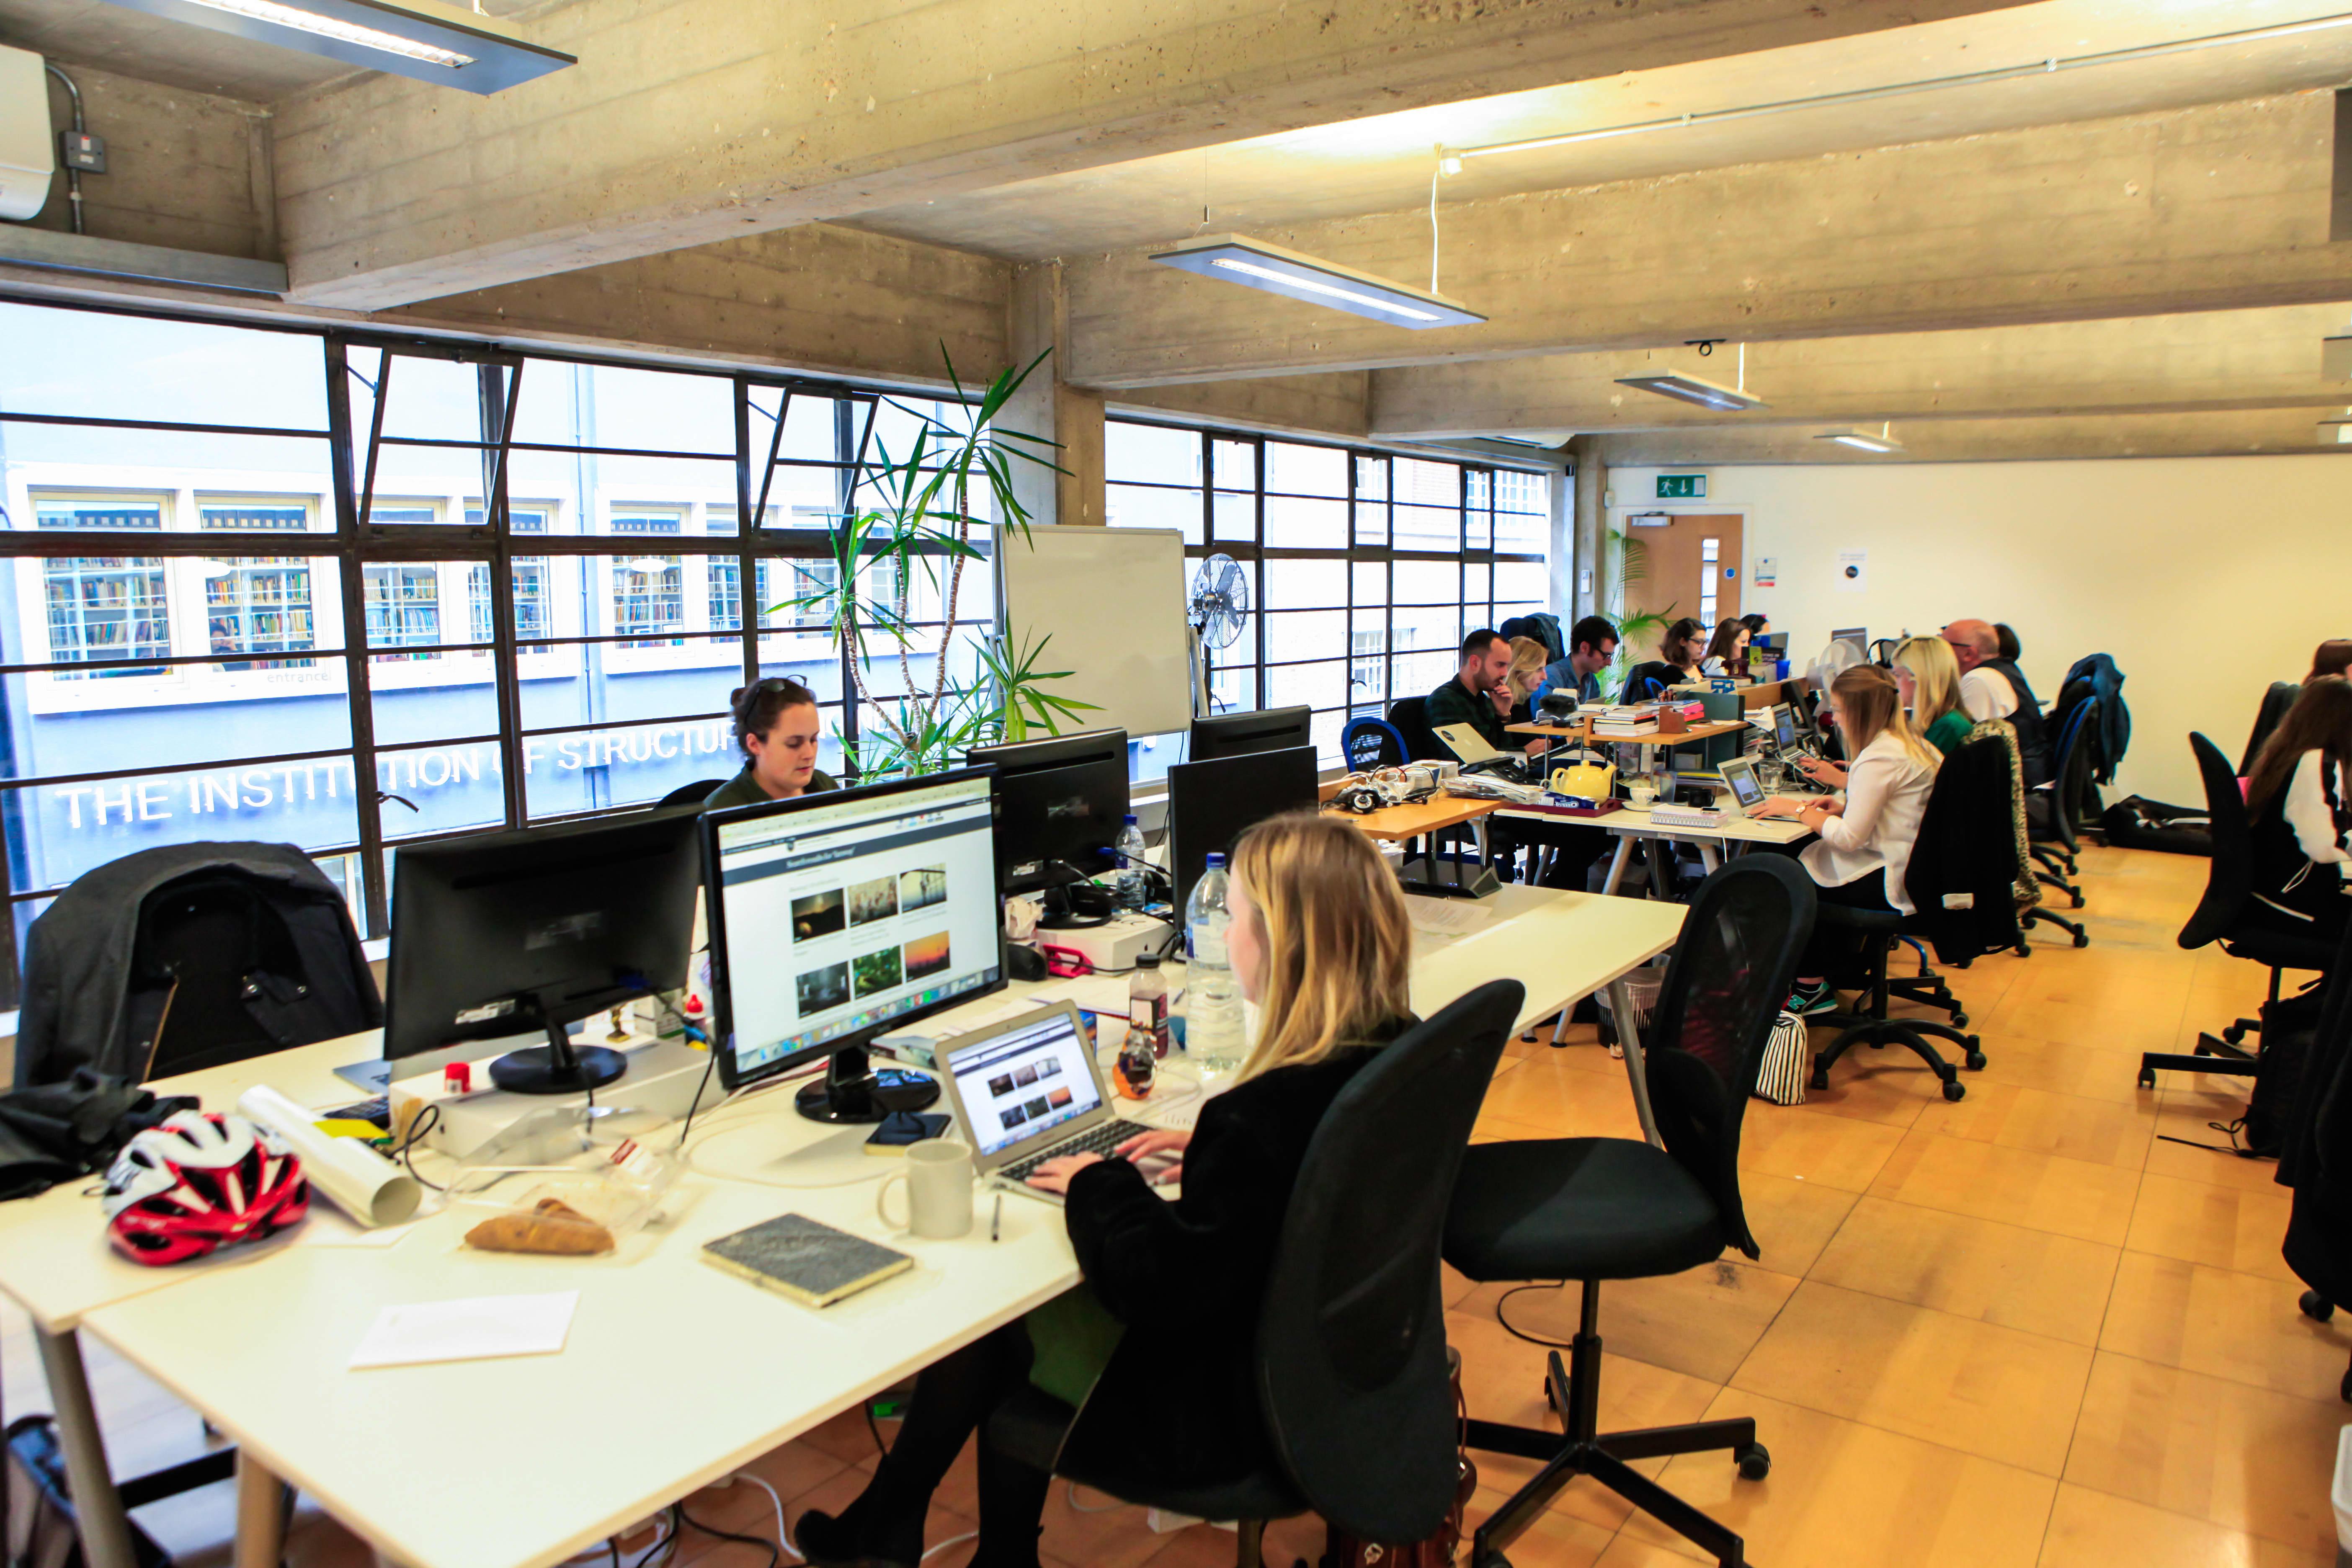 British start-up Culture Trip confirms layoffs